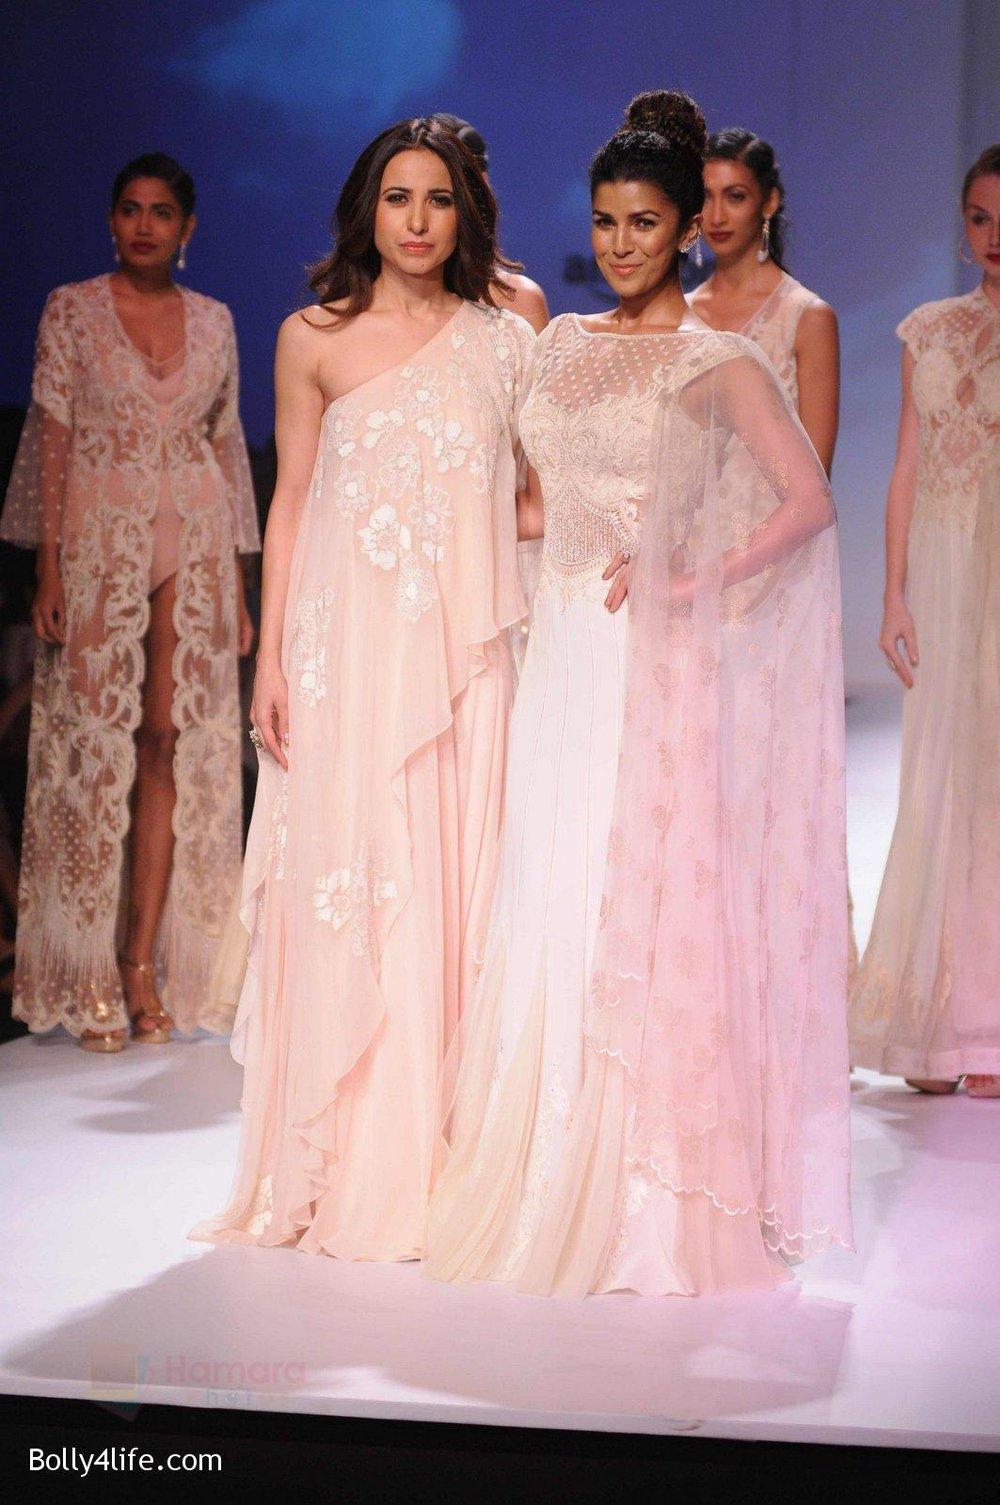 Nimrat-Kaur-walk-the-ramp-for-Mandira-Wrik_s-show-at-Amazon-India-Fashion-Week-on-15th-Oct-2016-7.jpg